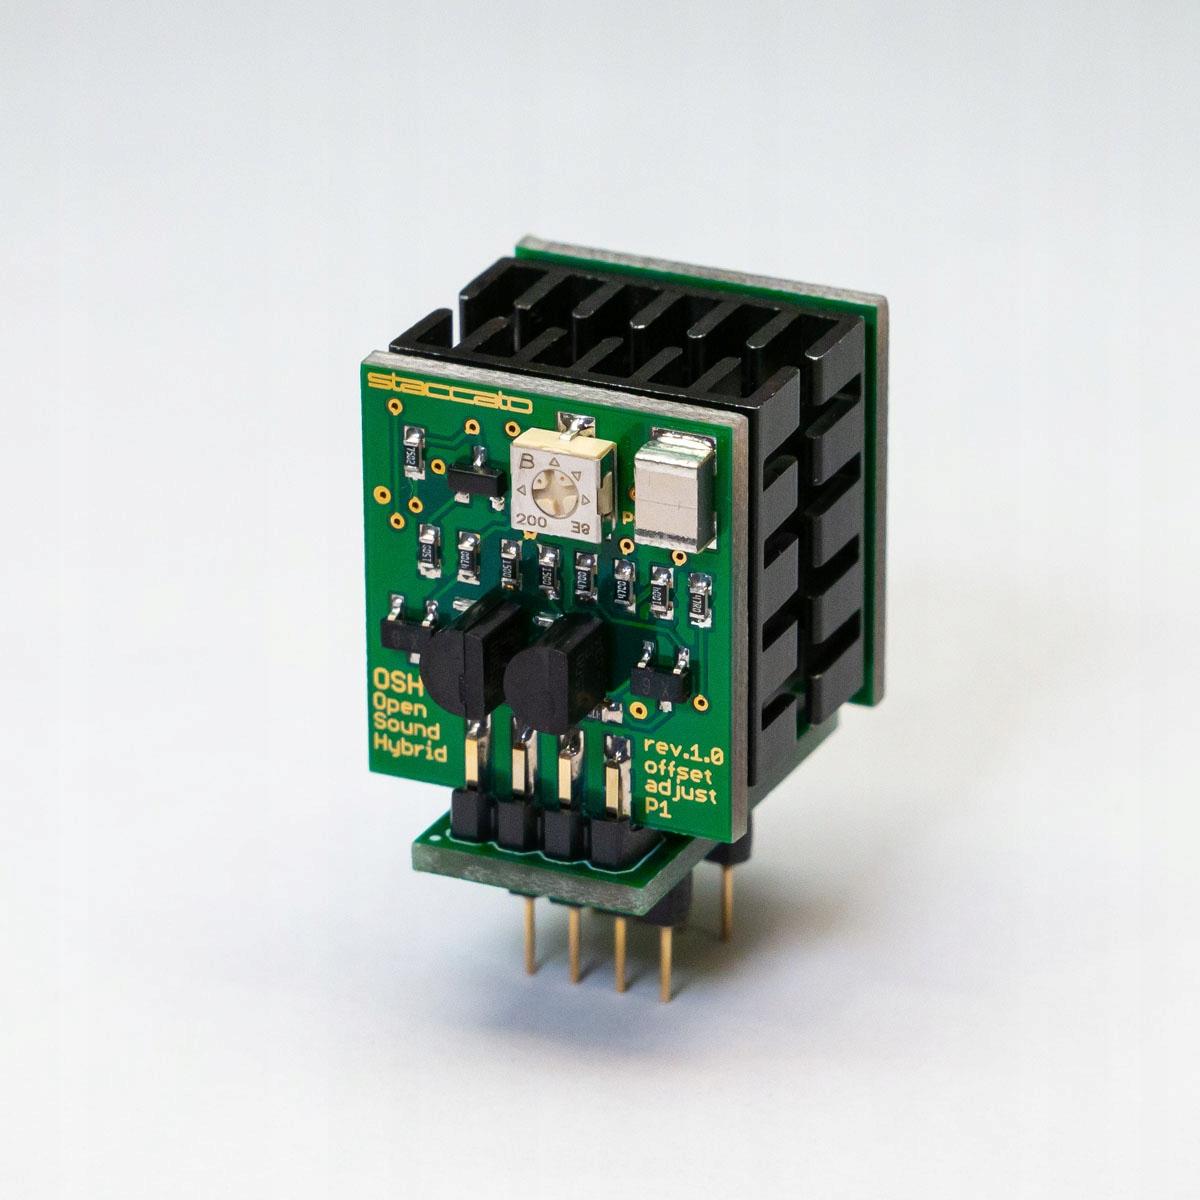 Стаккато OSH-DHb opamp wzmacniacz operacyjny двойной